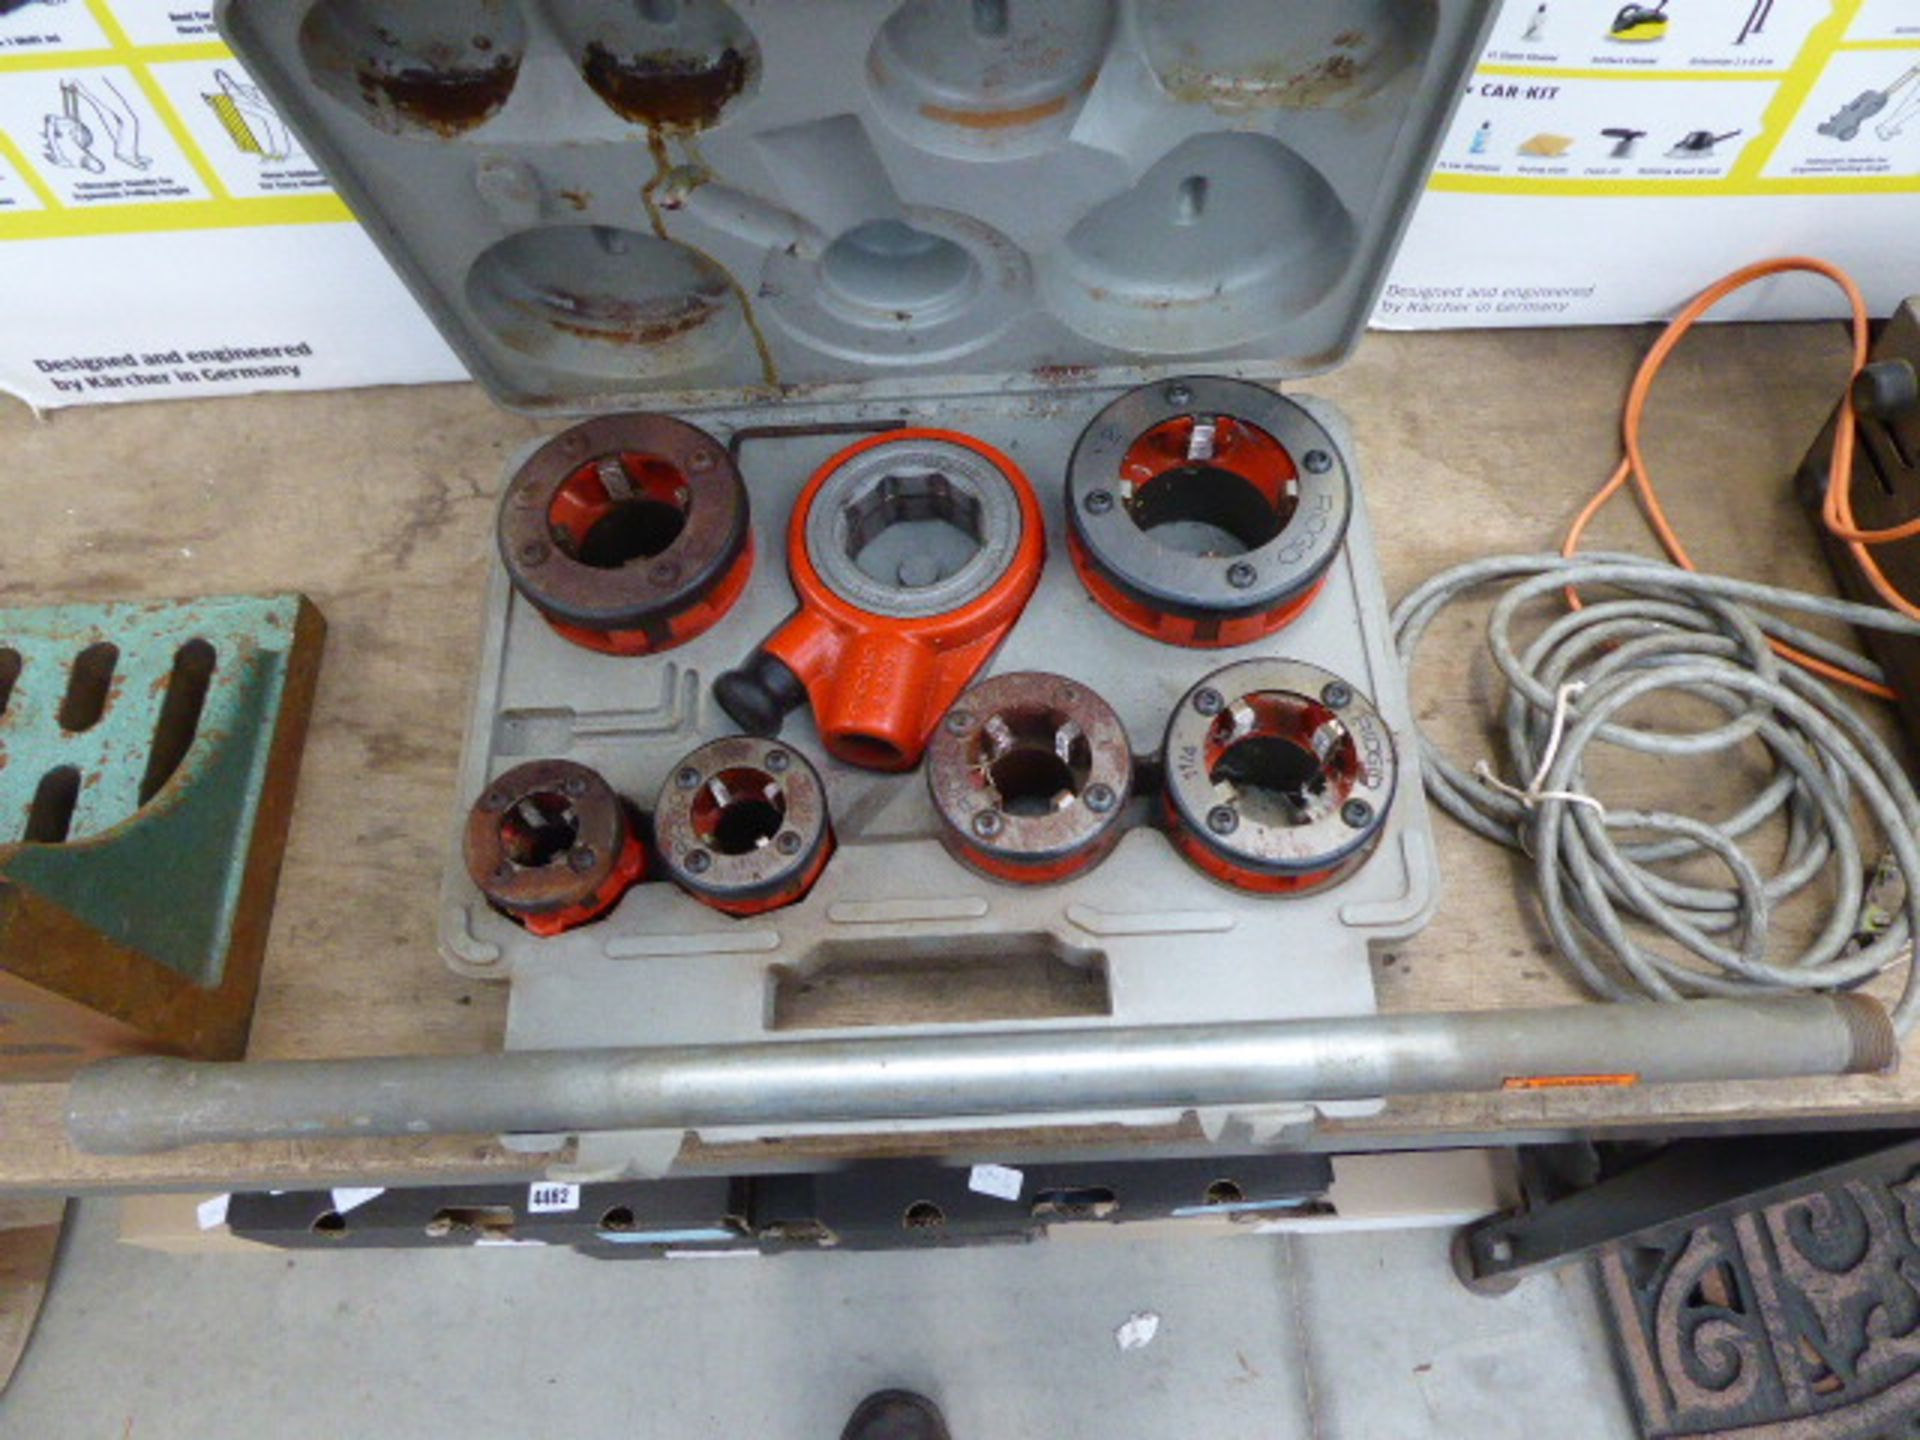 Lot 4483 - Rigid pipe threading kit